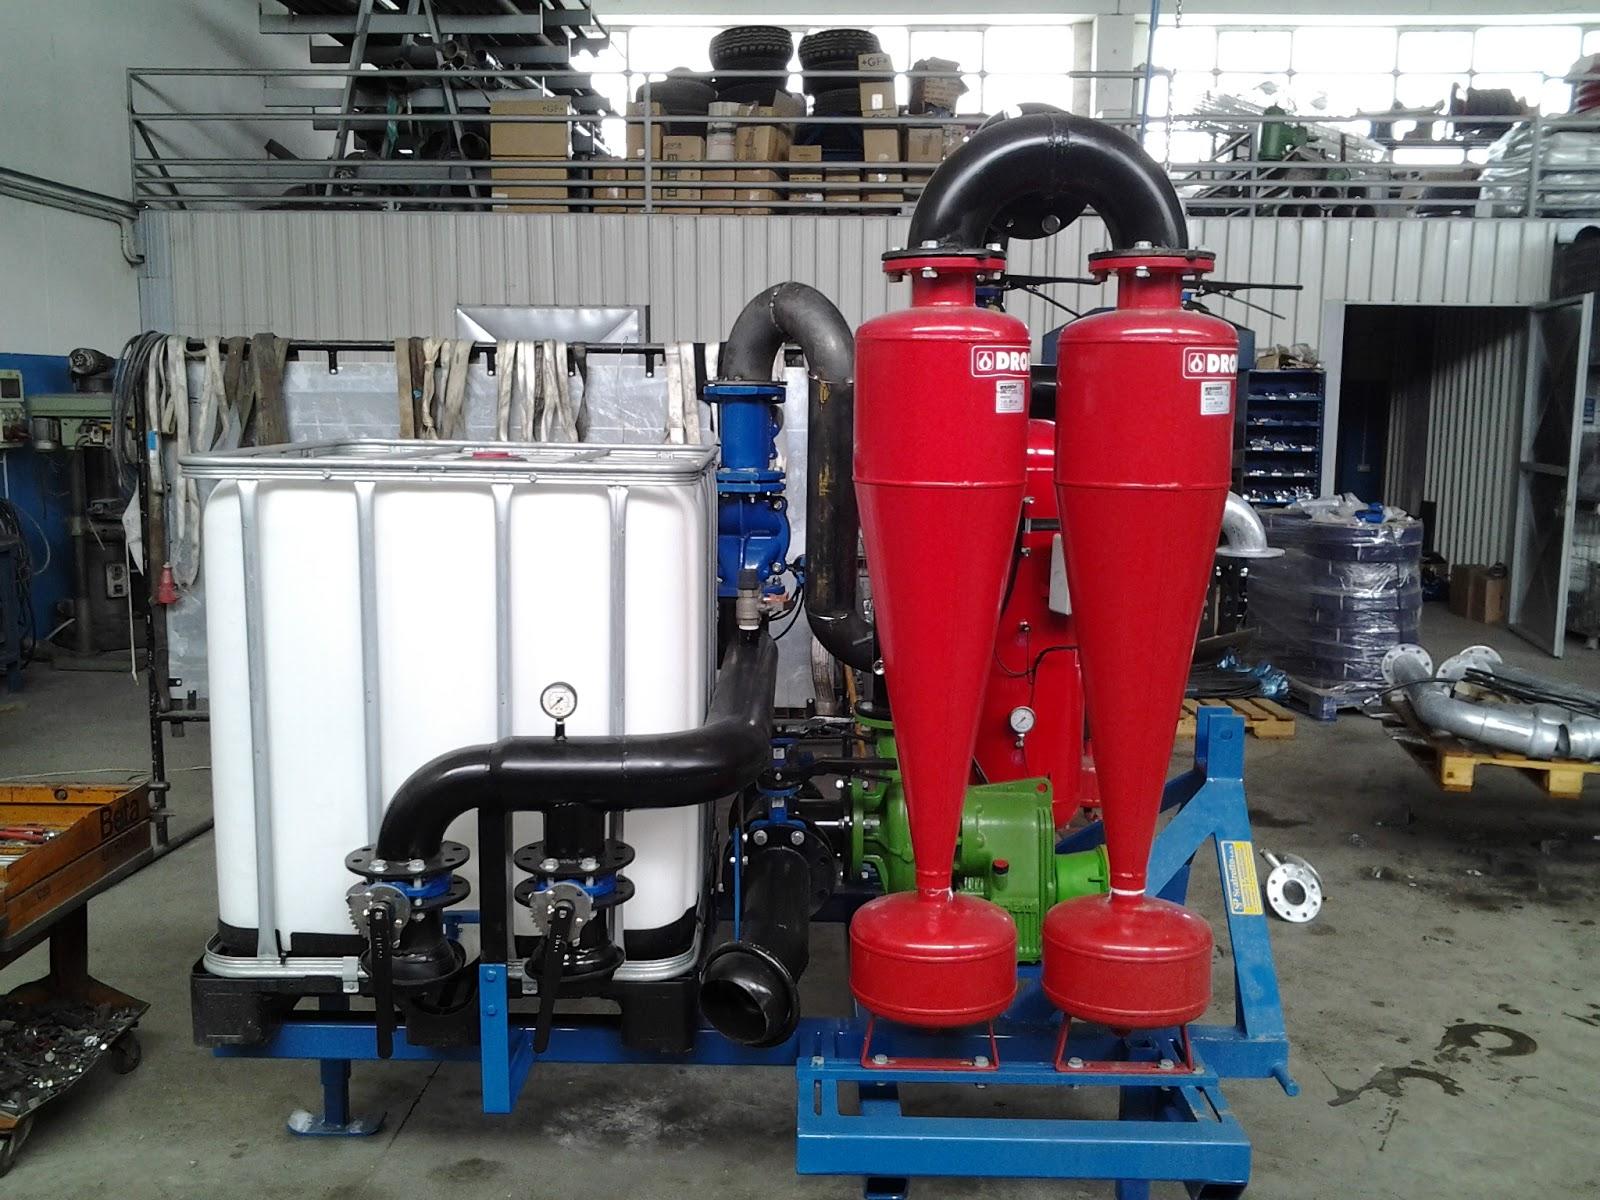 Irrigazione a goccia microirrigazione e fertirrigazione for Idrociclone per sabbia usato